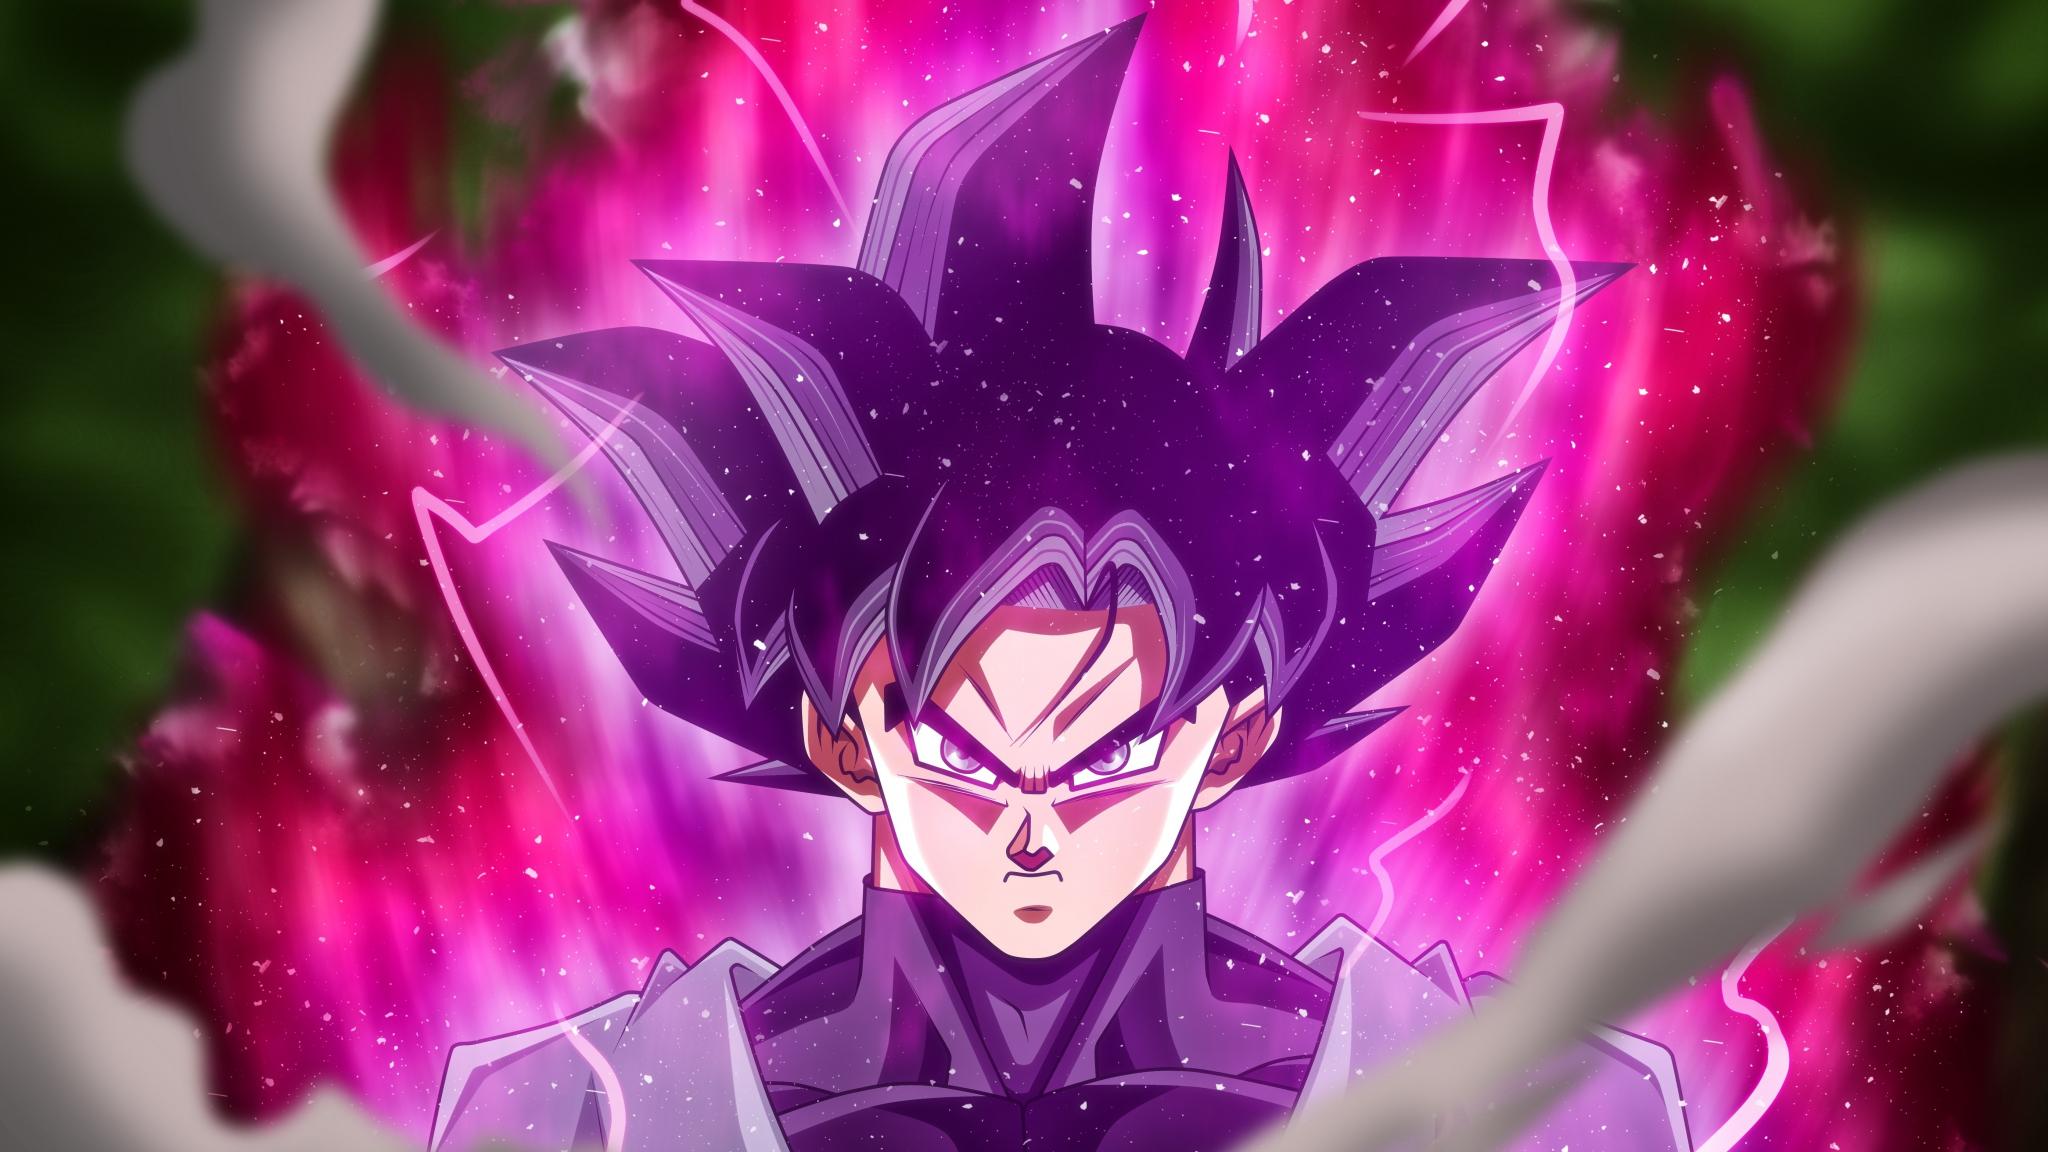 Download 2048x1152 Wallpaper Goku Black Dragon Ball Super